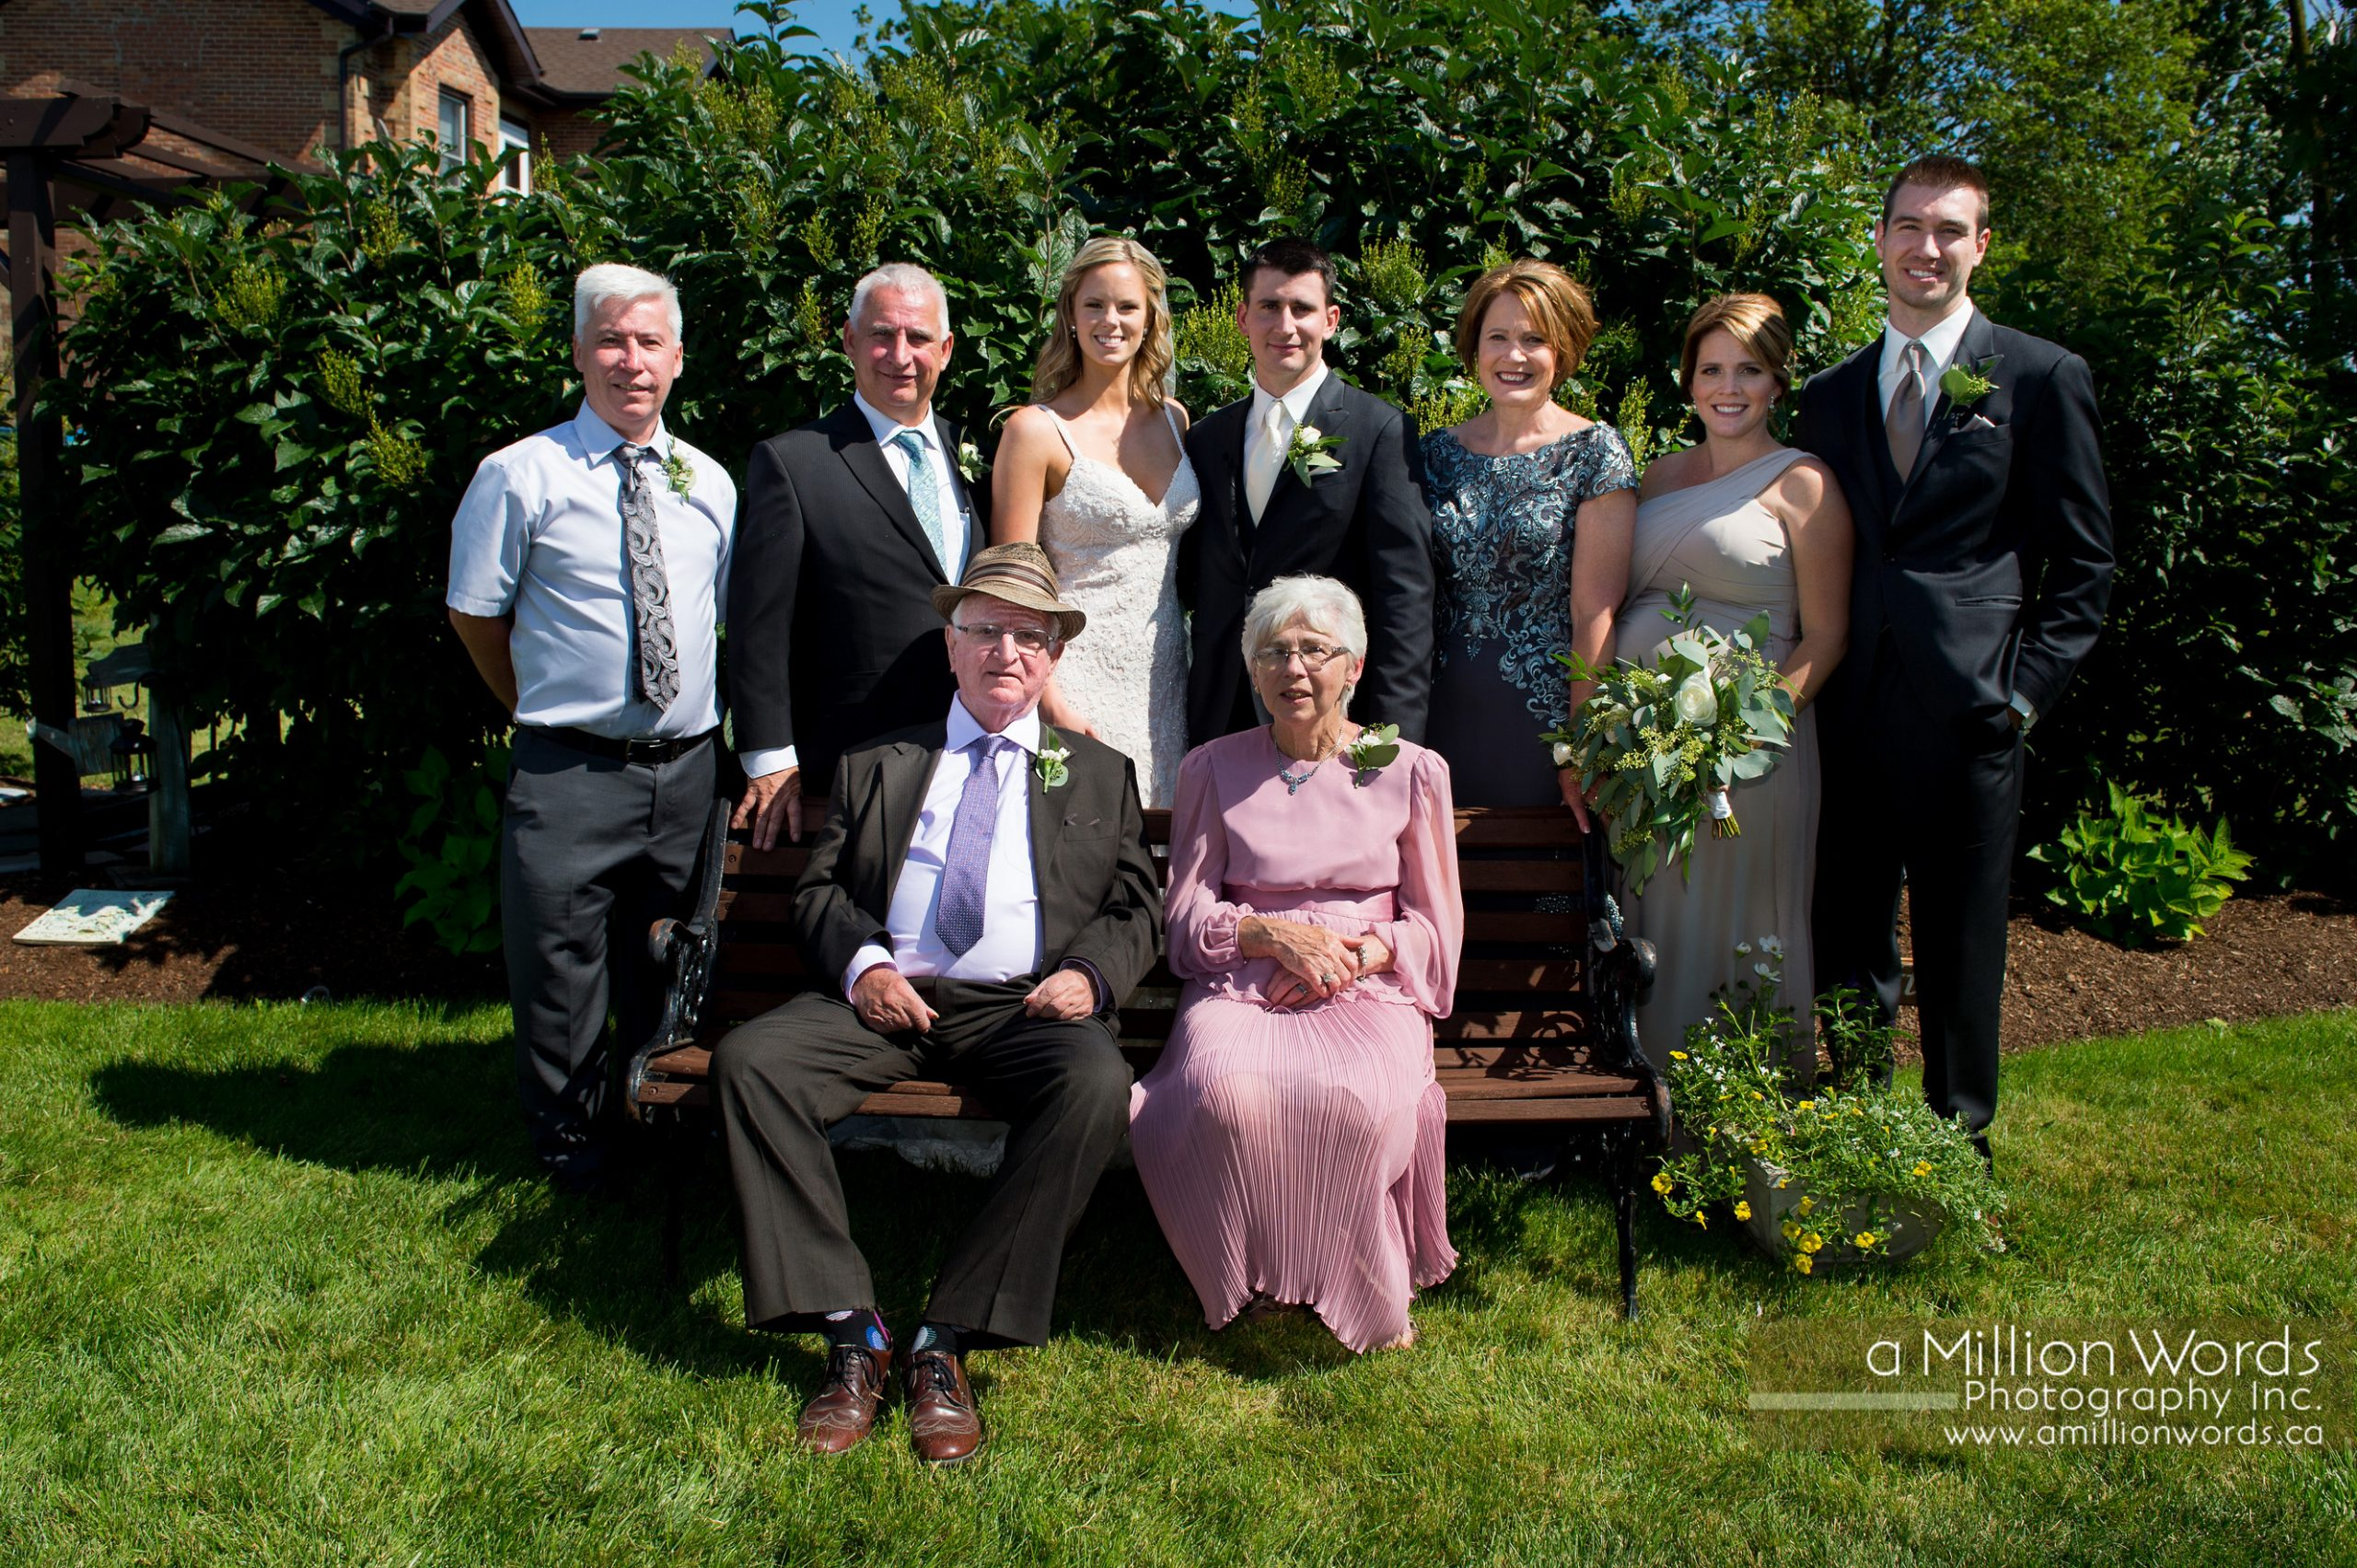 arthur_wedding_photographer43